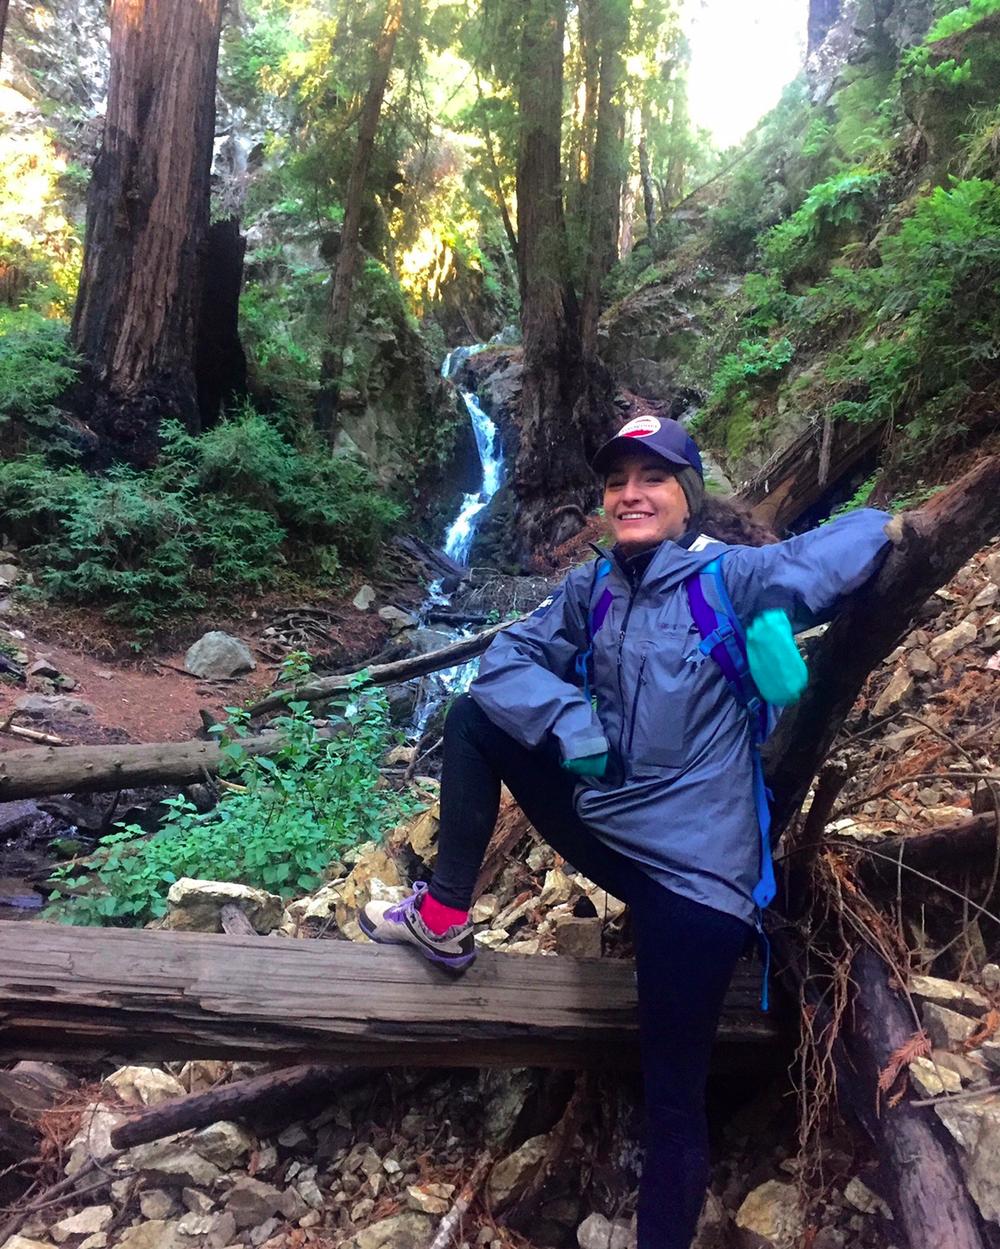 Trip Lead: Lisa de Rafols - Contact Lisa:derafols@usc.eduRead Lisa's bio here.